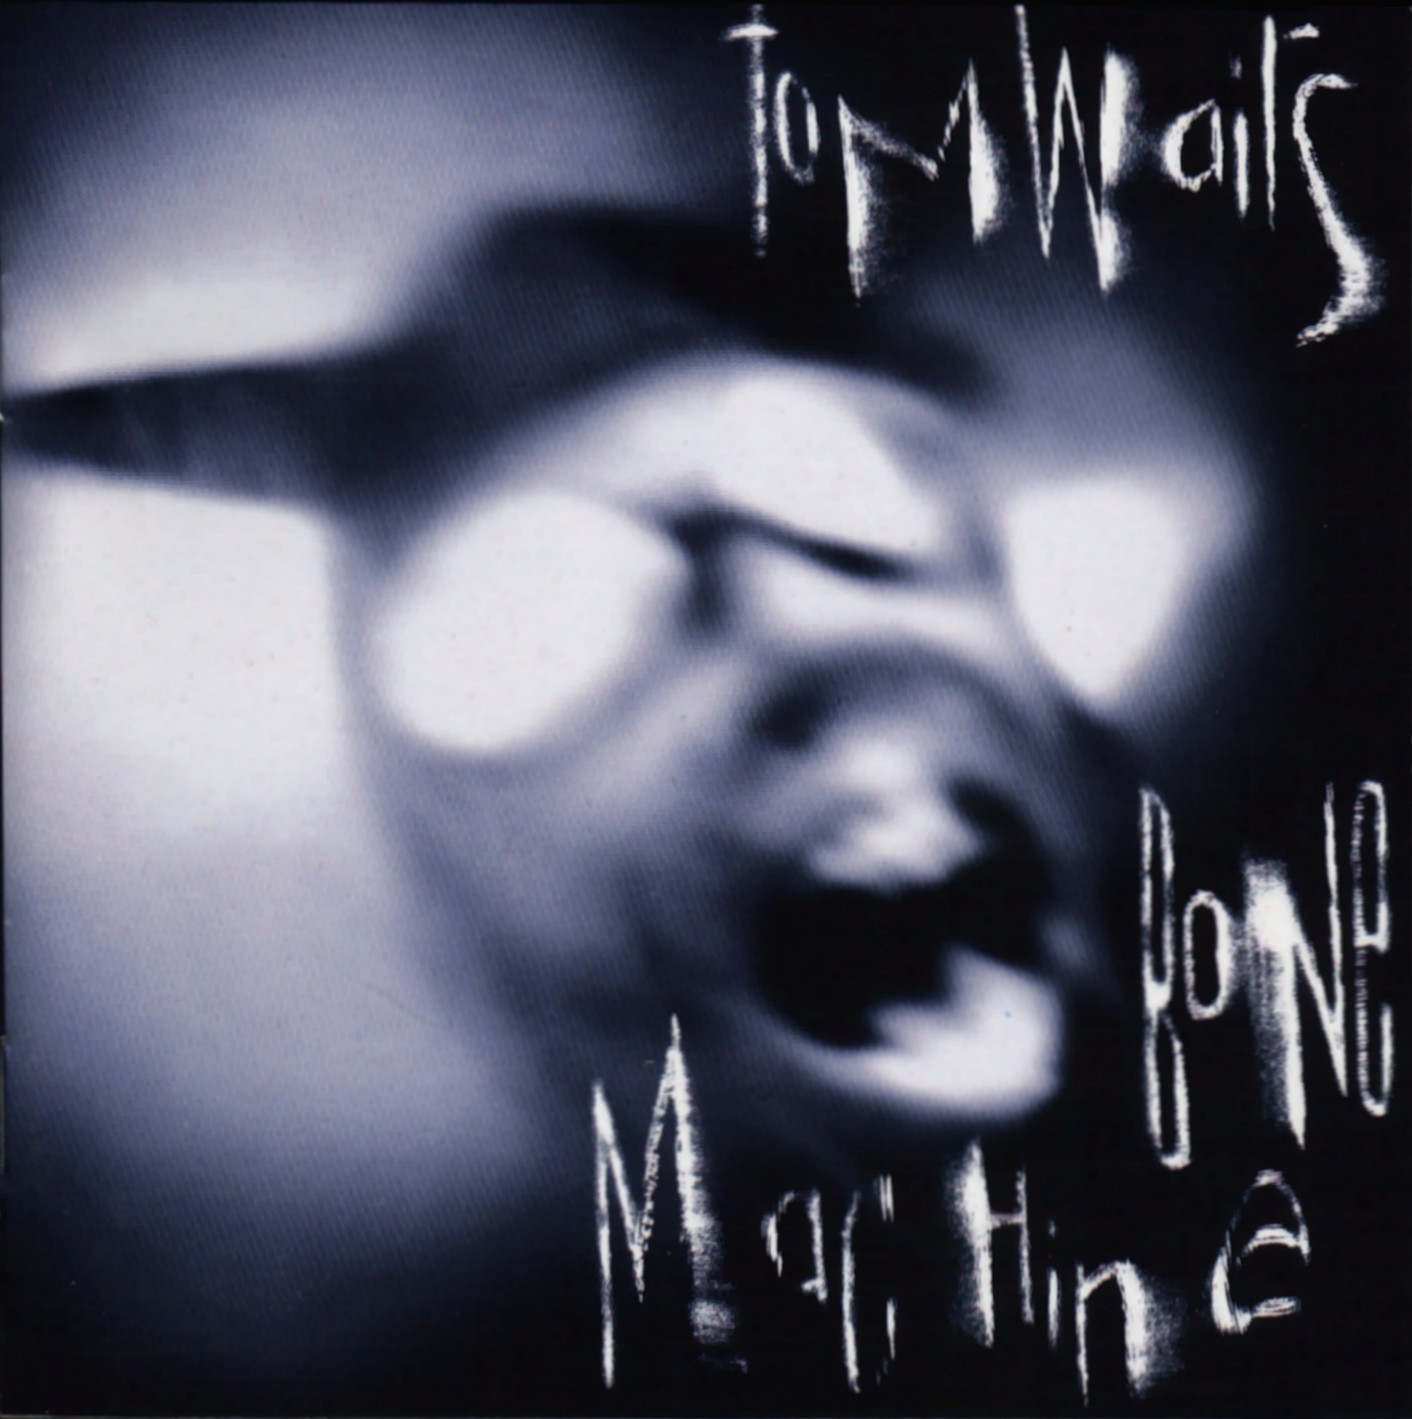 1001 discos que hay que escuchar antes de morir - Página 9 %5BAllCDCovers%5D_tom_waits_bone_machine_1992_retail_cd-front